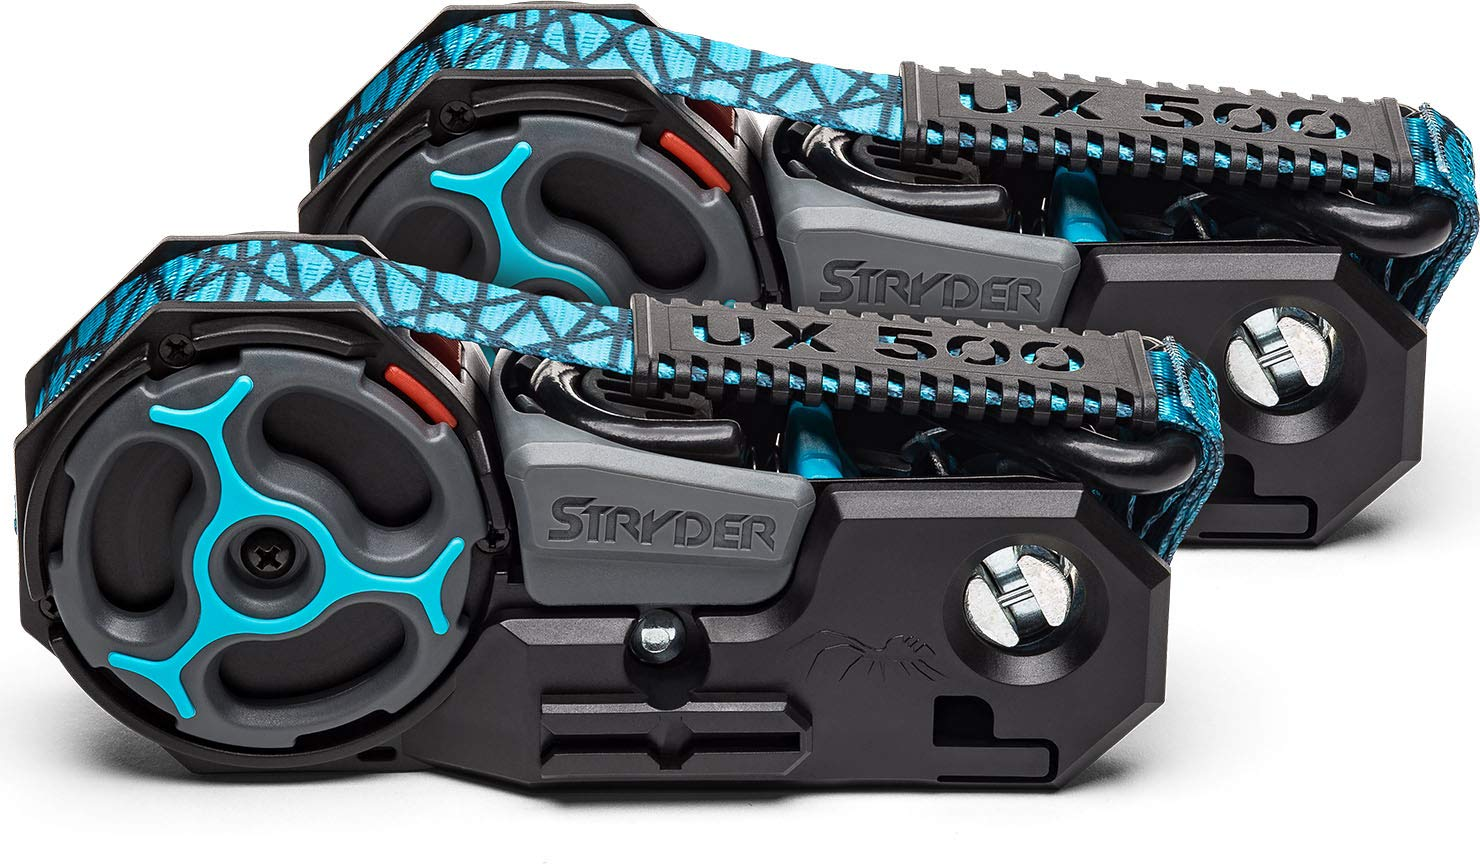 12 x 1 500 lb Working Load Limit 1500 lb Break Strength Stryder UX500-01A Retractable Ratchet Tie Down Straps